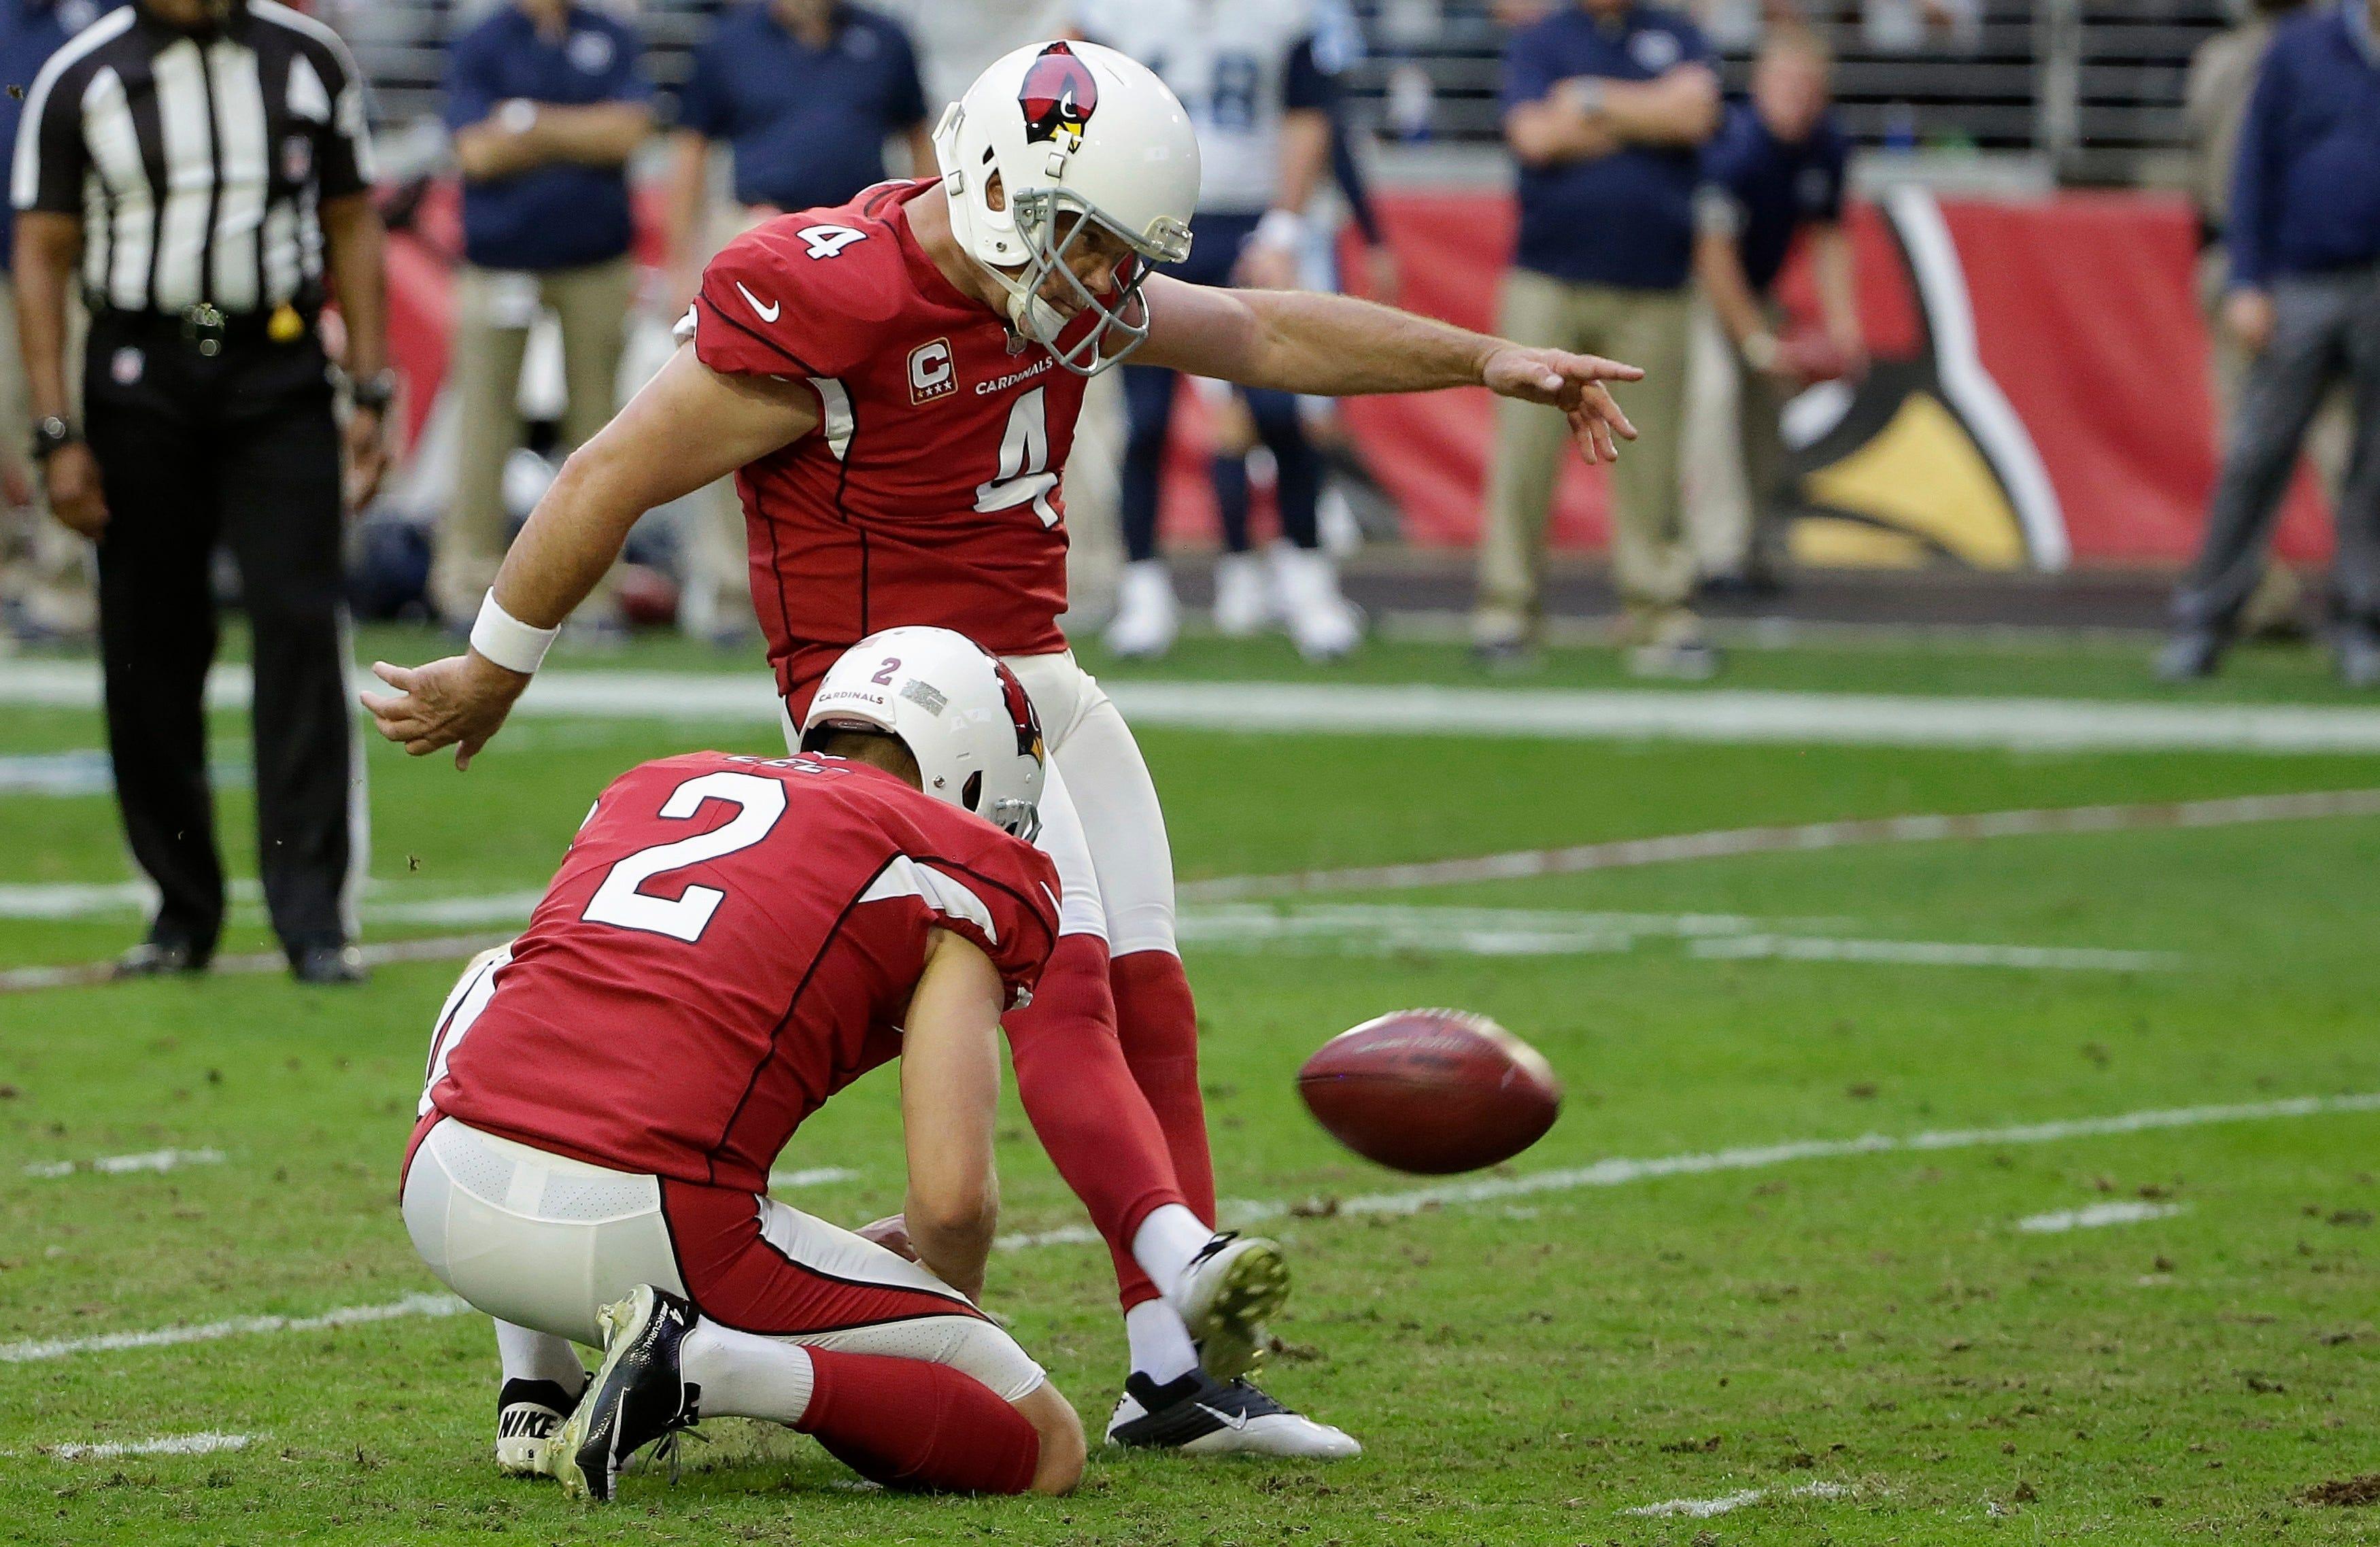 Cardinals' defense shuts down Titans in 12-7 victory